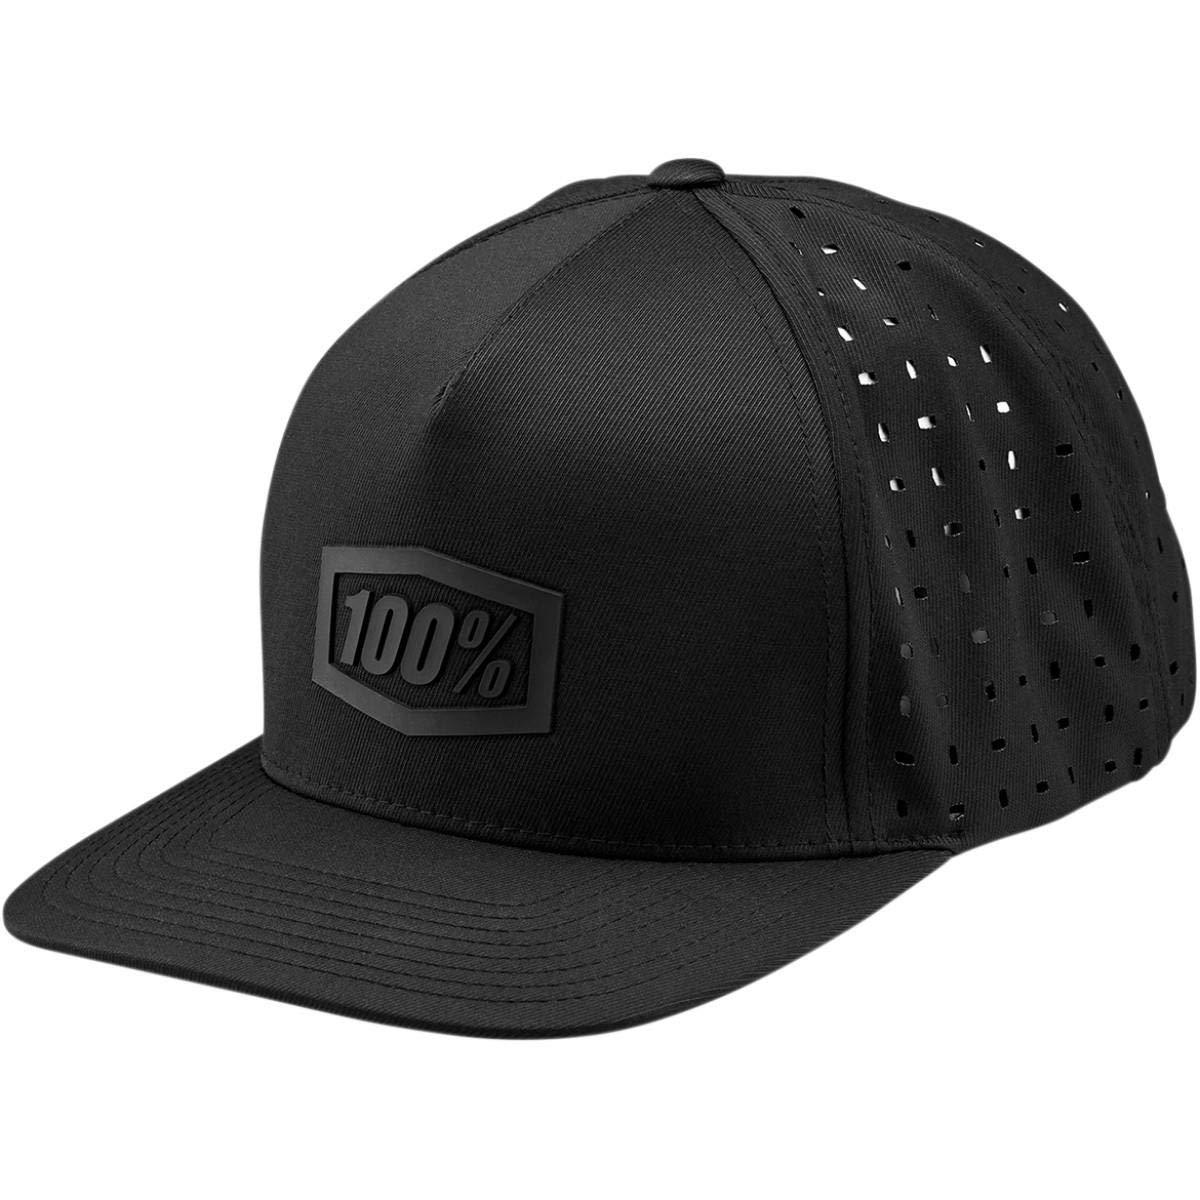 Amazon.com  100% Palace Snapback Hat (ONE SIZE)  Automotive f963daa3d4b